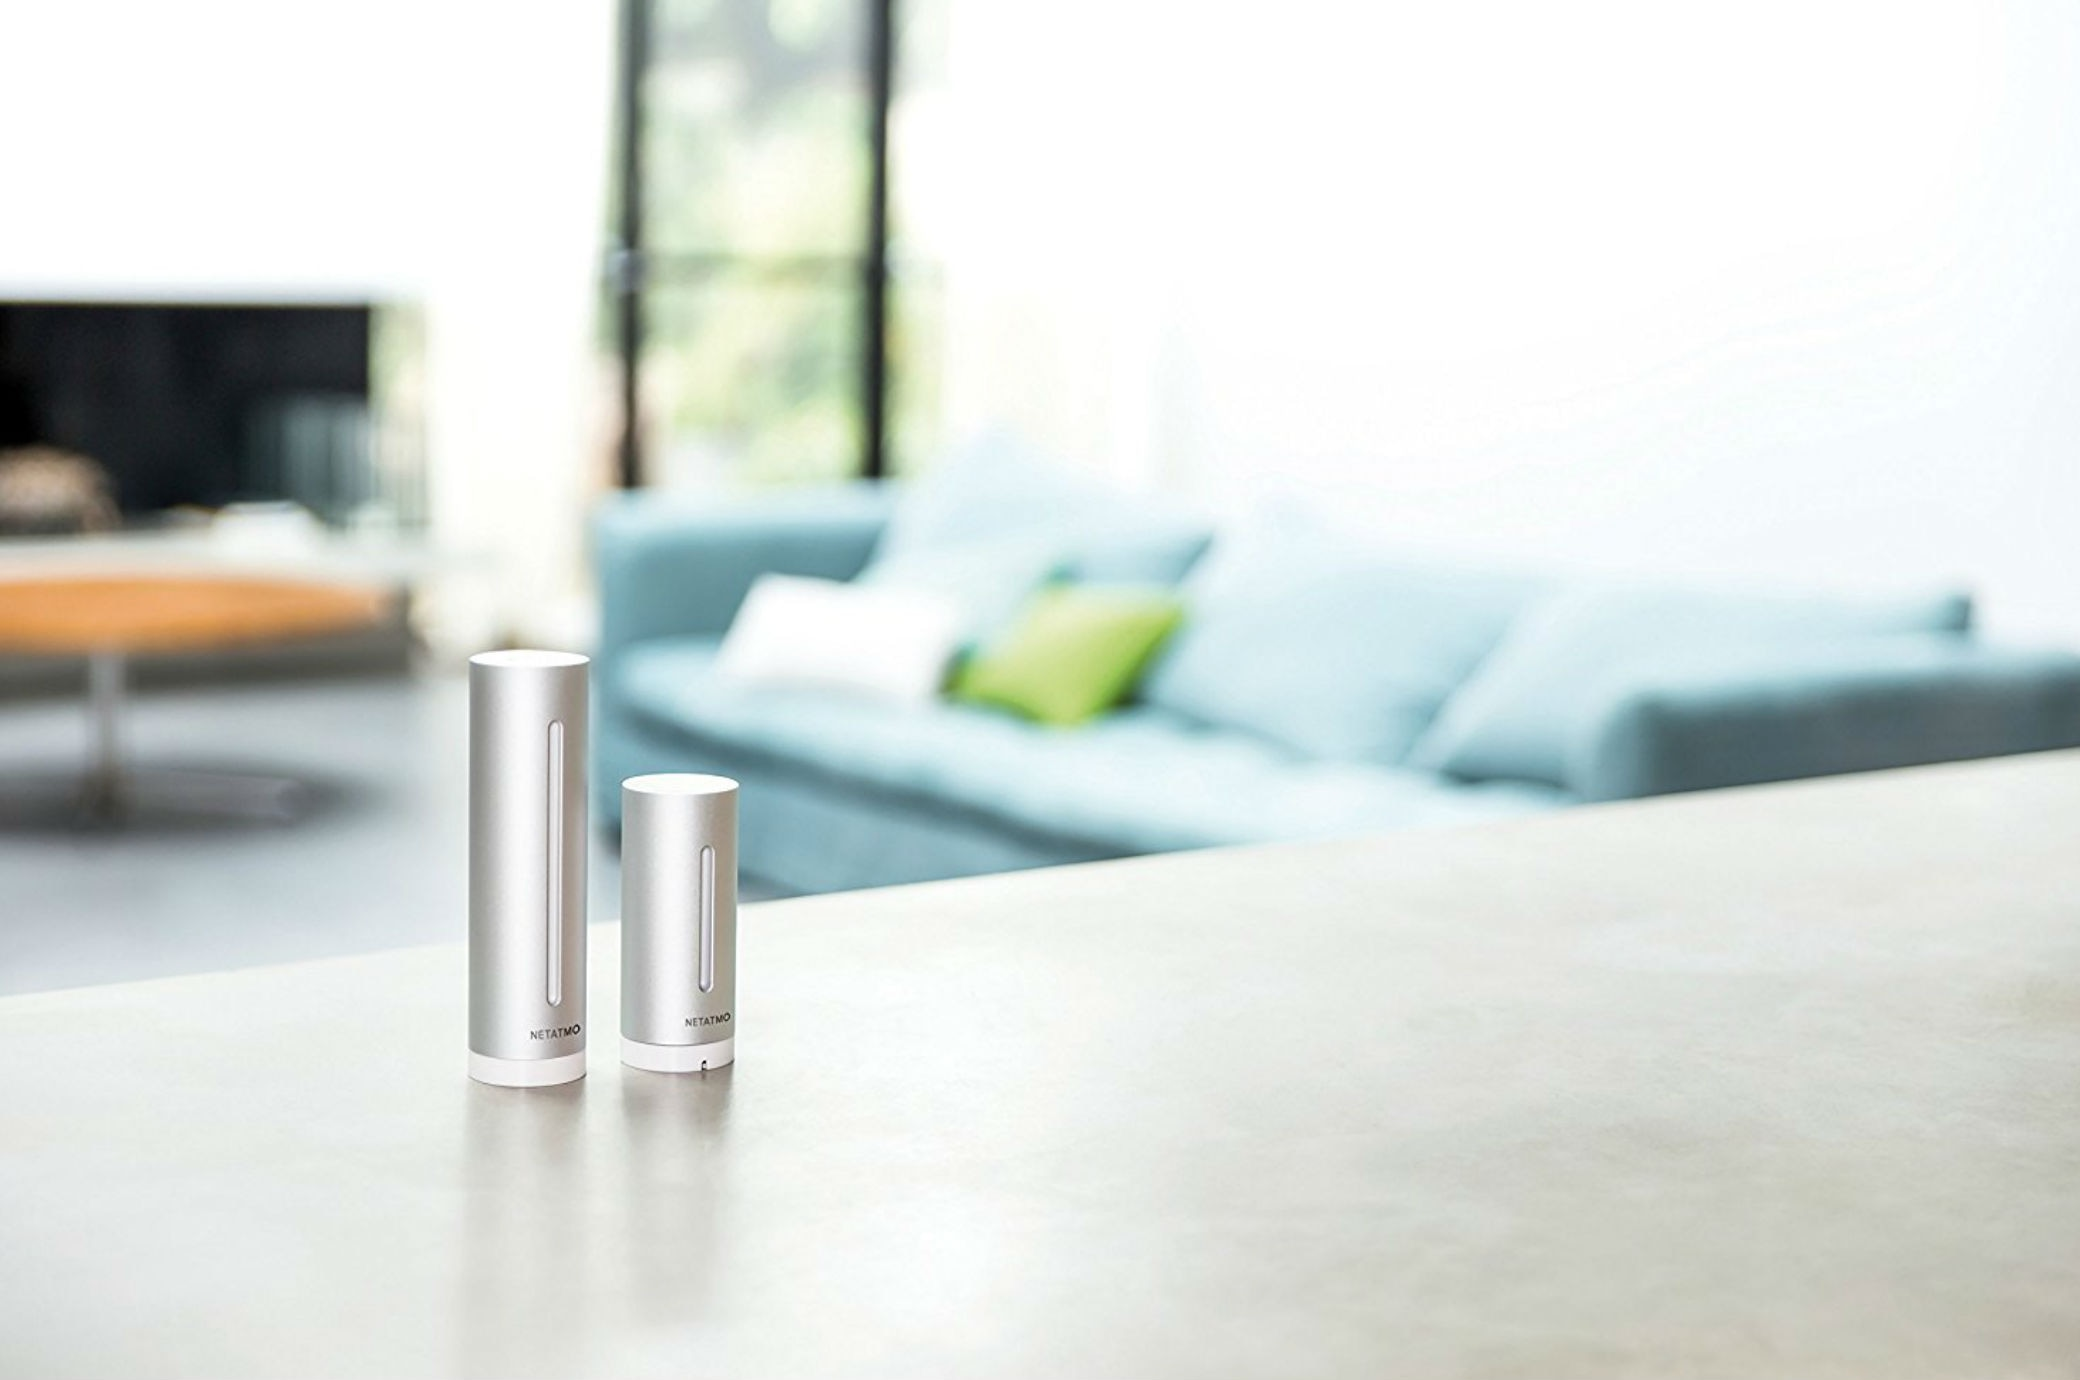 dieses ger t beugt schimmel in ihrer wohnung vor techbook. Black Bedroom Furniture Sets. Home Design Ideas